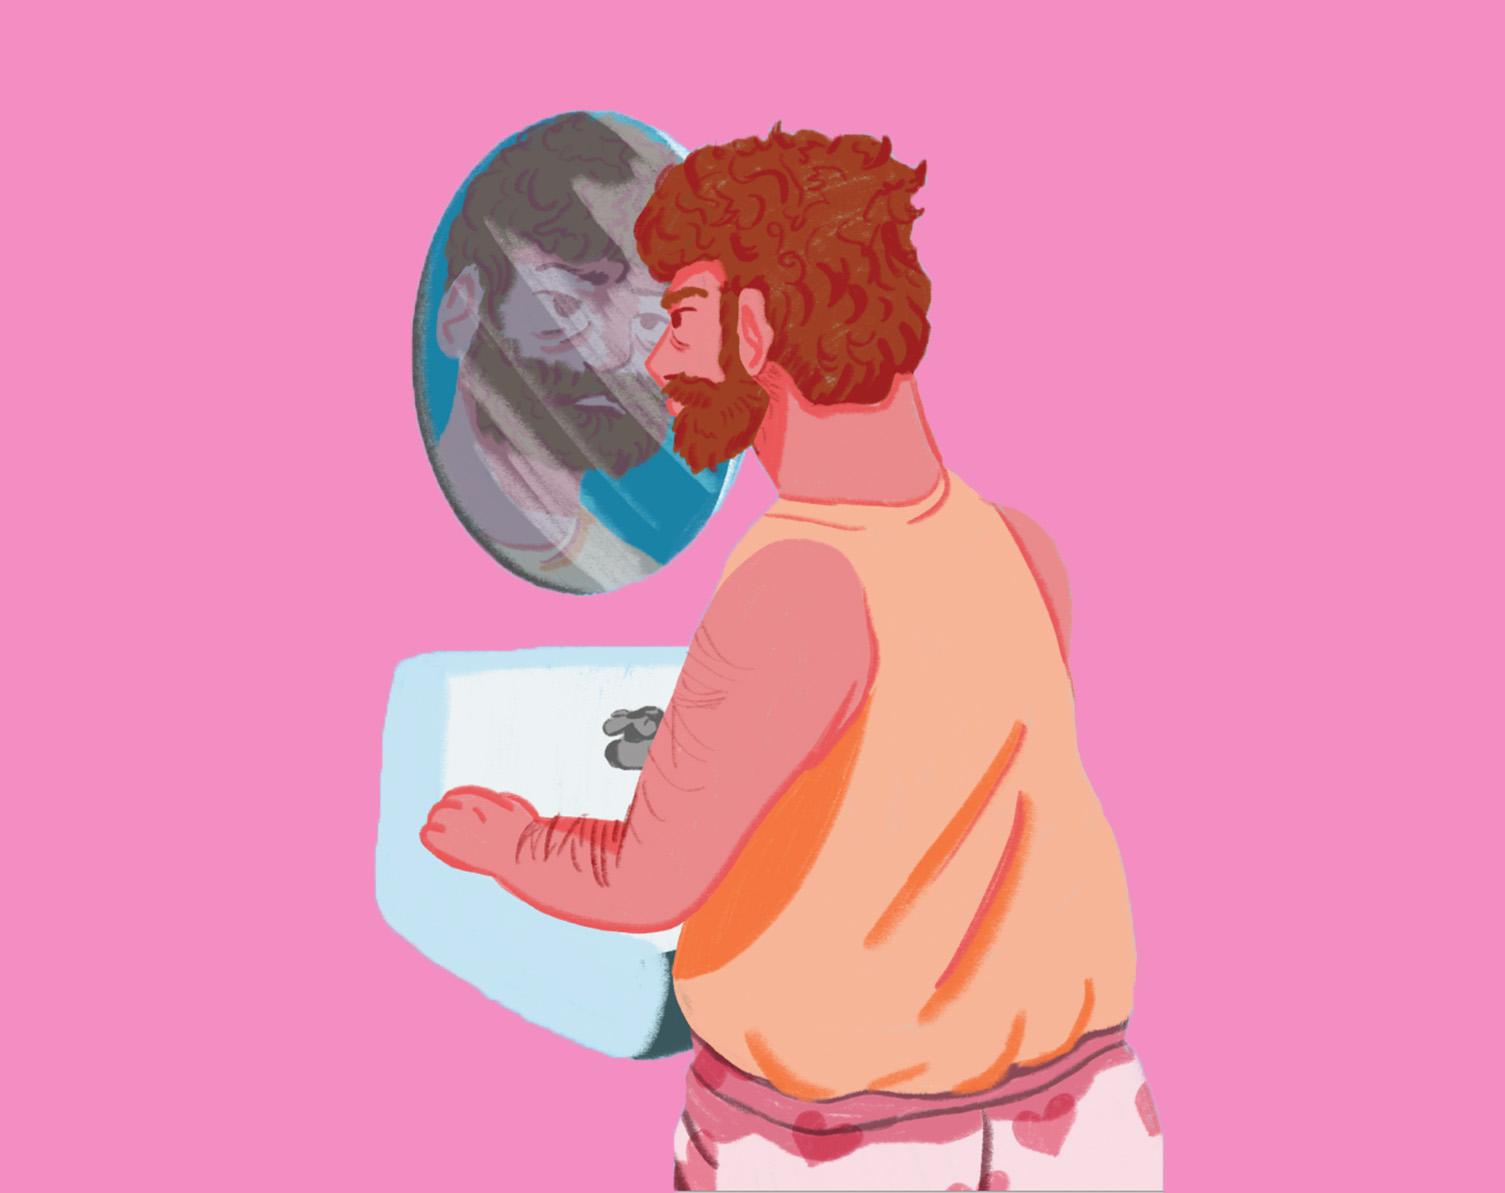 Artwork of man staring into bathroom mirror